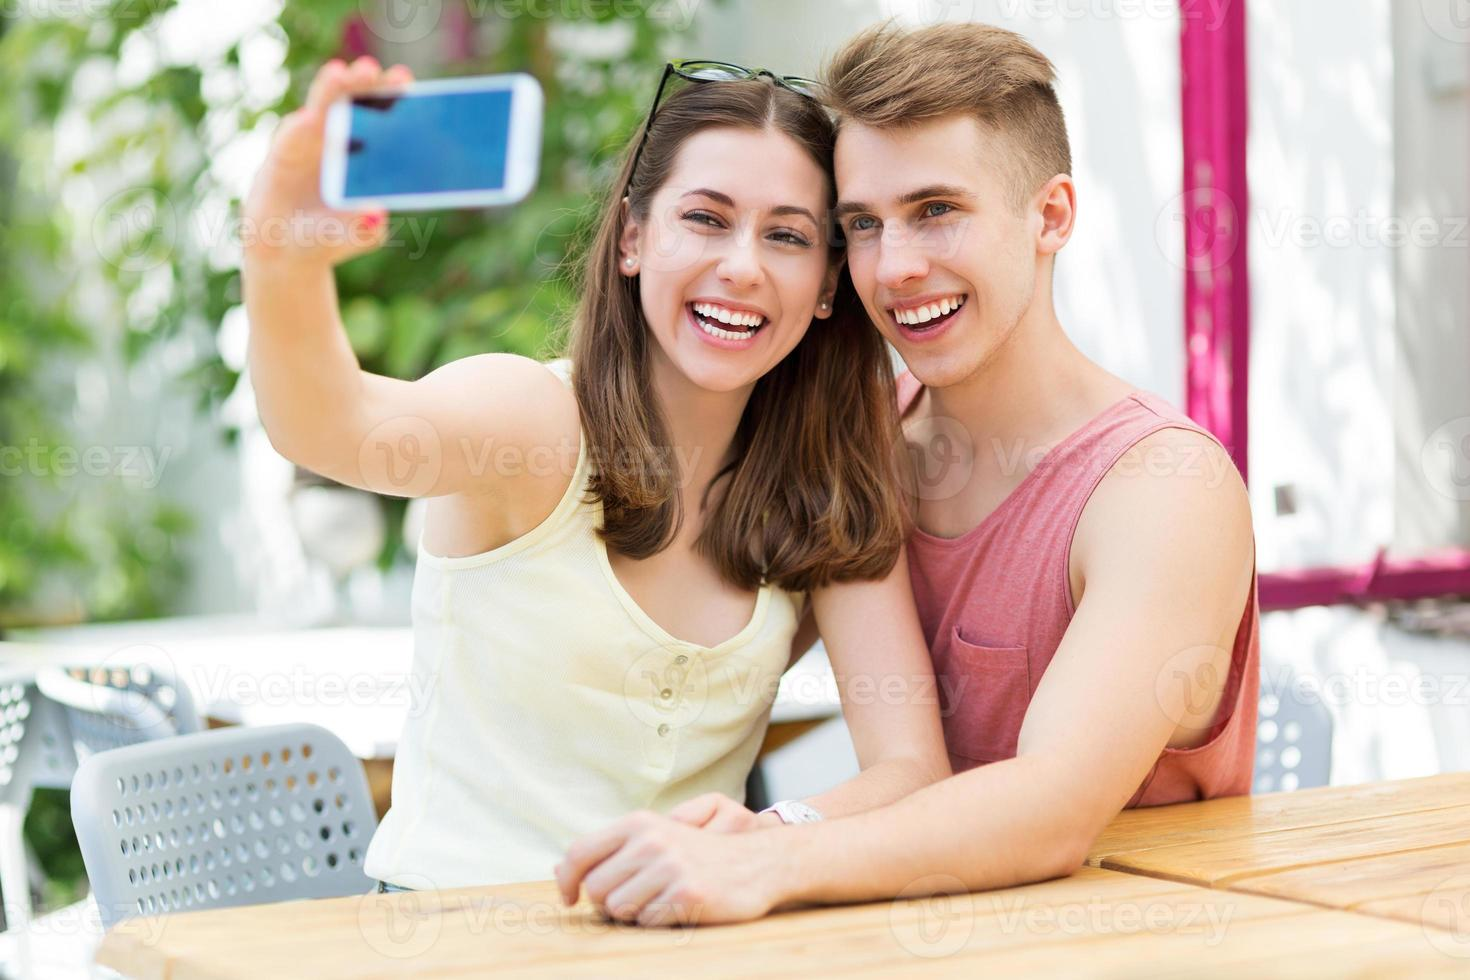 Couple taking selfie photo